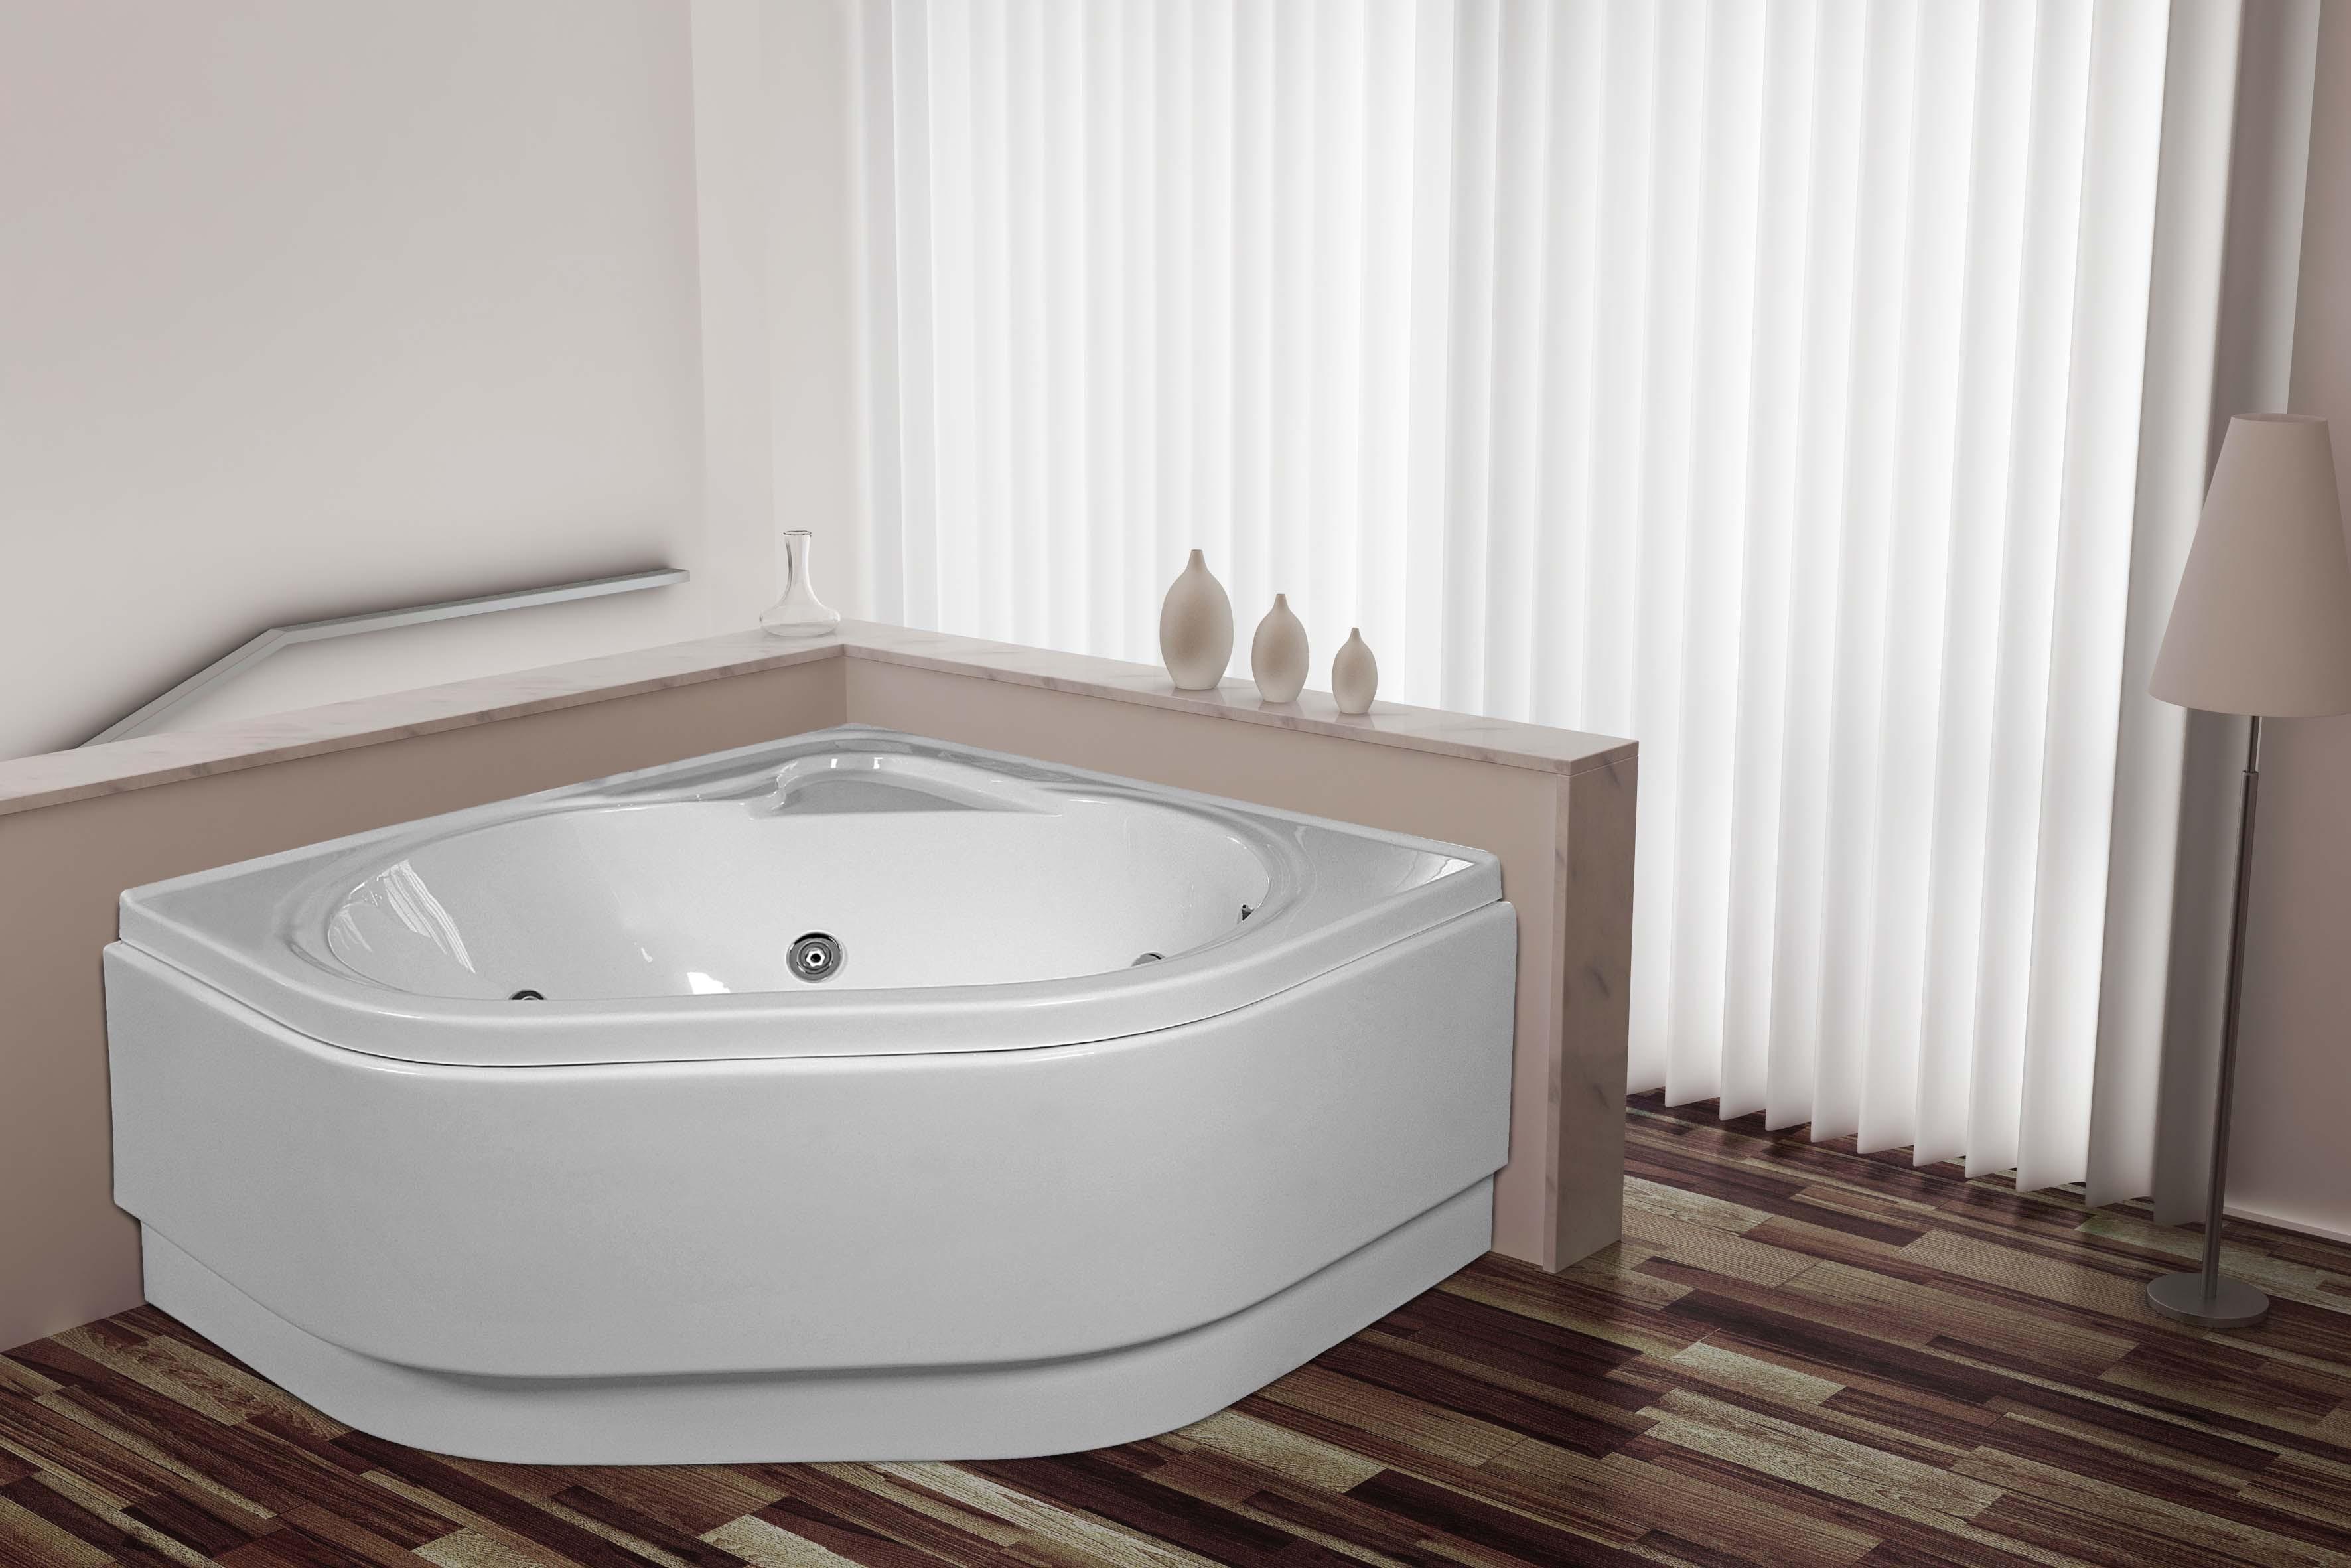 Vasche Da Bagno Jetfun : Vendita vascha da bagno idromassaggio jetfun mod balnea online